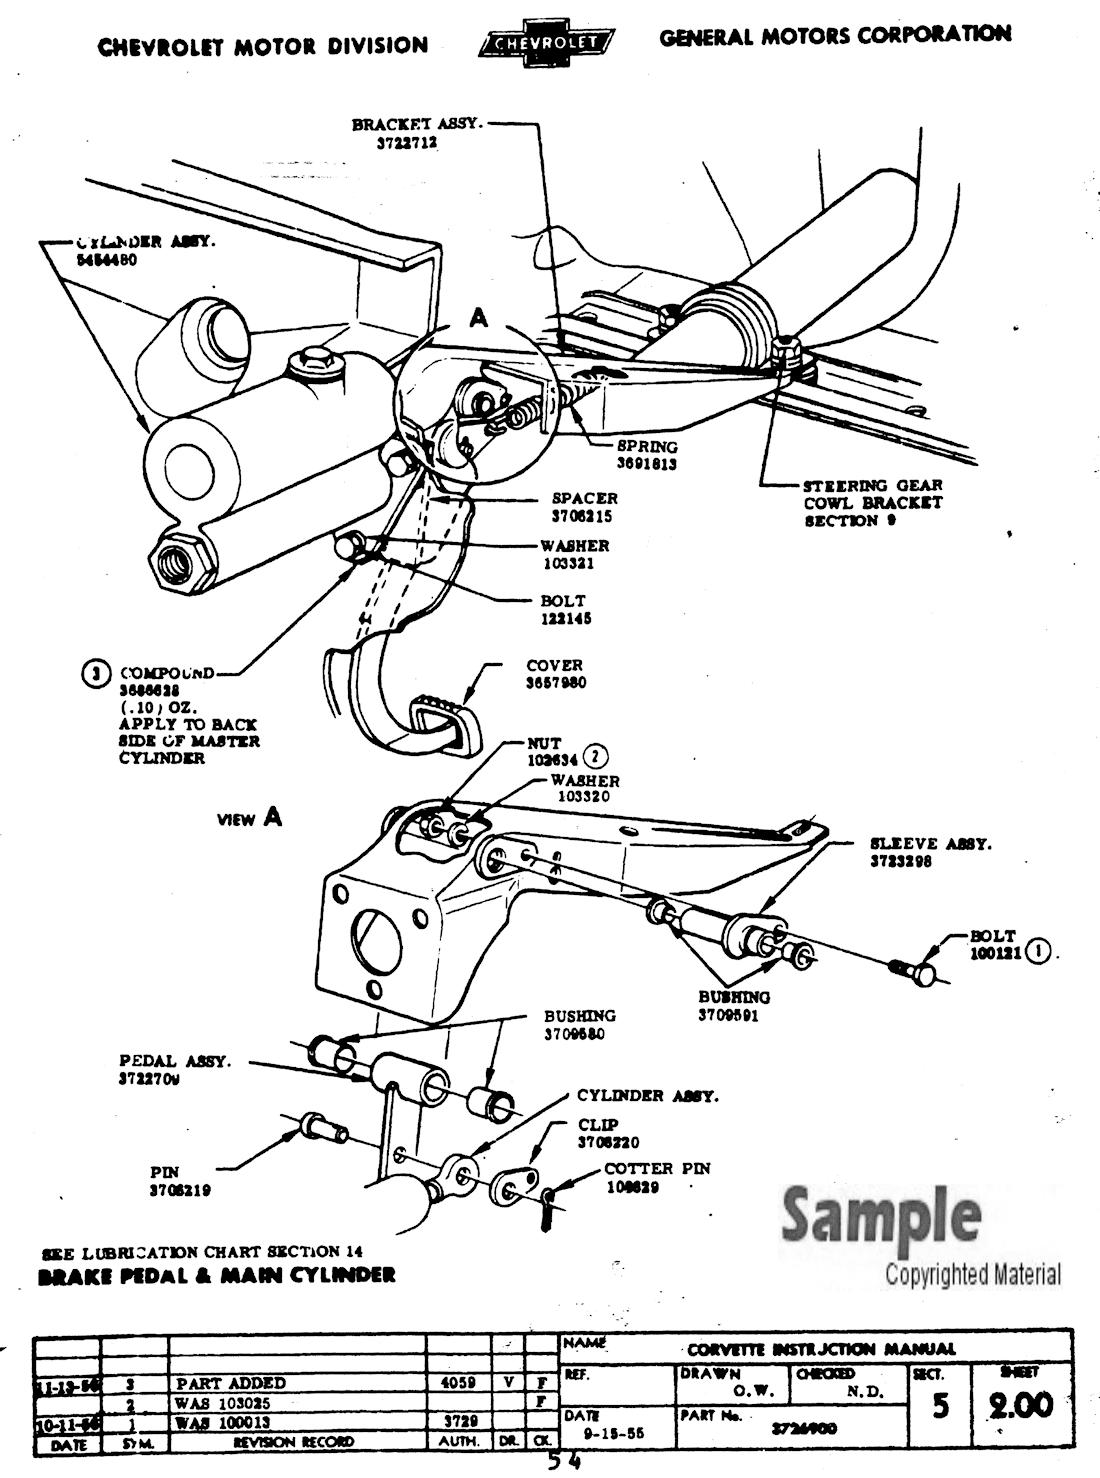 1956 1957 corvette factory assembly manual brake pedal s le page